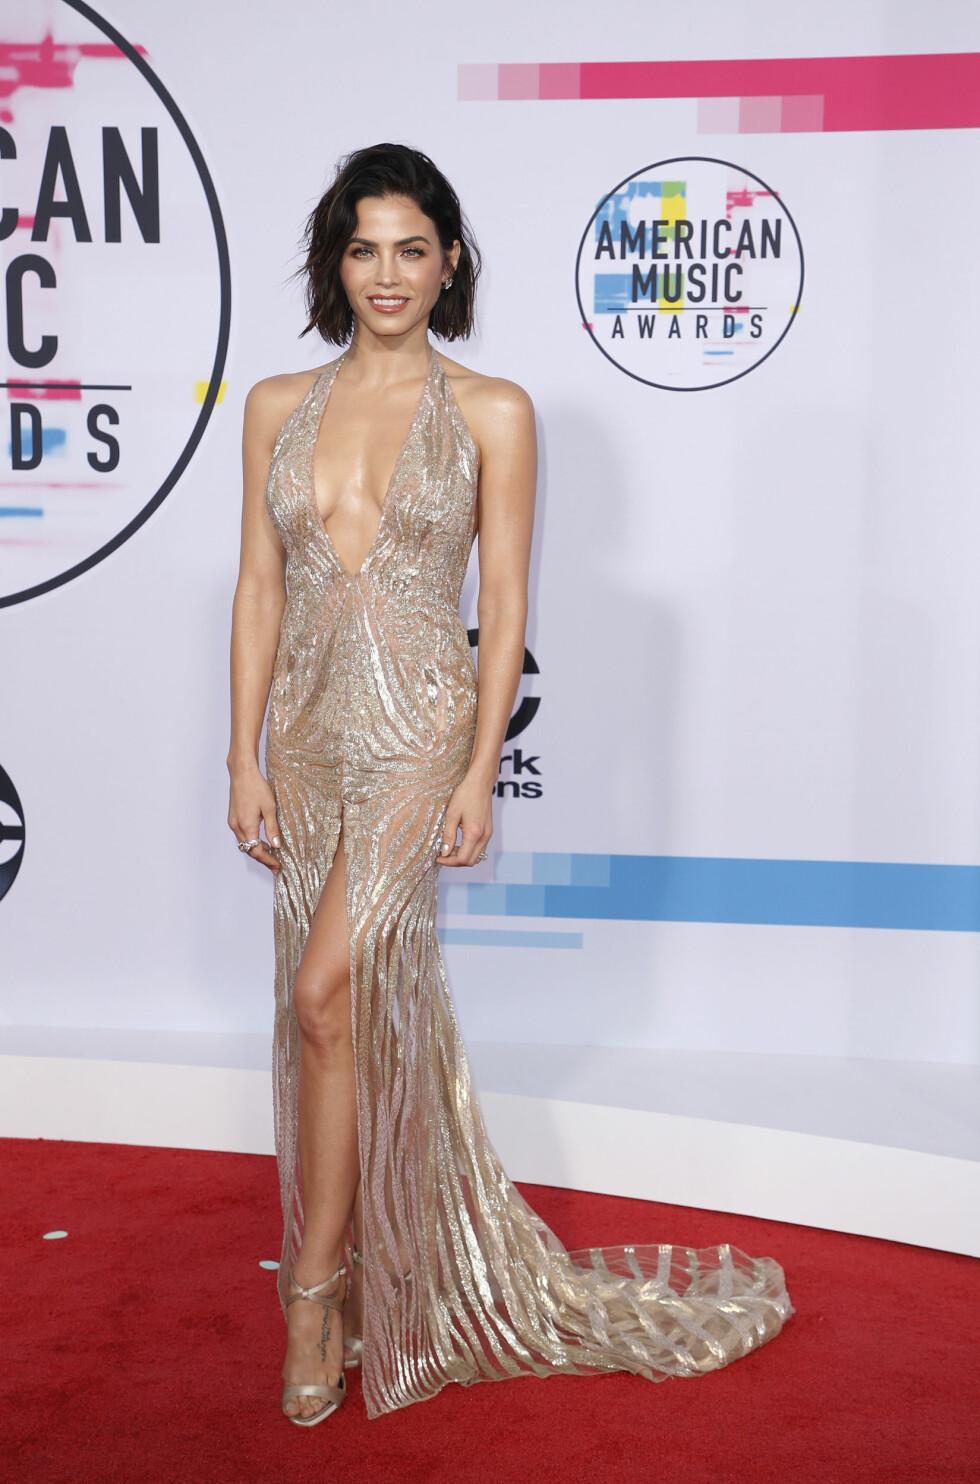 AMERICAN MUSIC AWARDS: Jenna Dewan Tatum